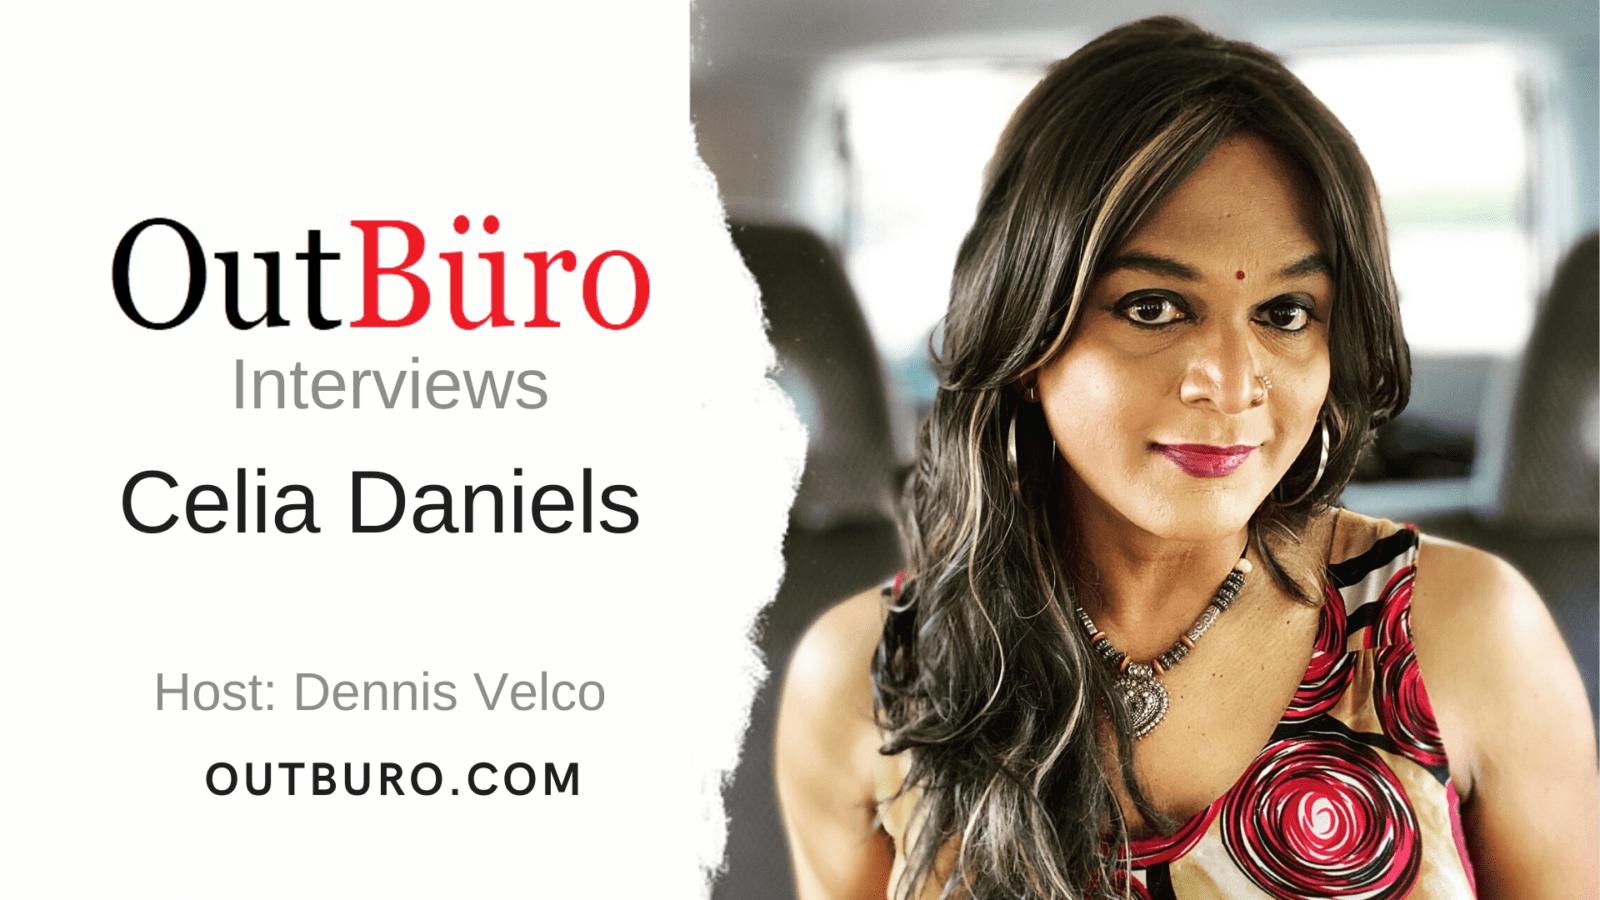 OutBüro Interviews - Celia Daniels - Trans Activist Community Leader Transgender LGBT Entrepreneur Strategic Business Consultant Transgender Startup Professional Mentor